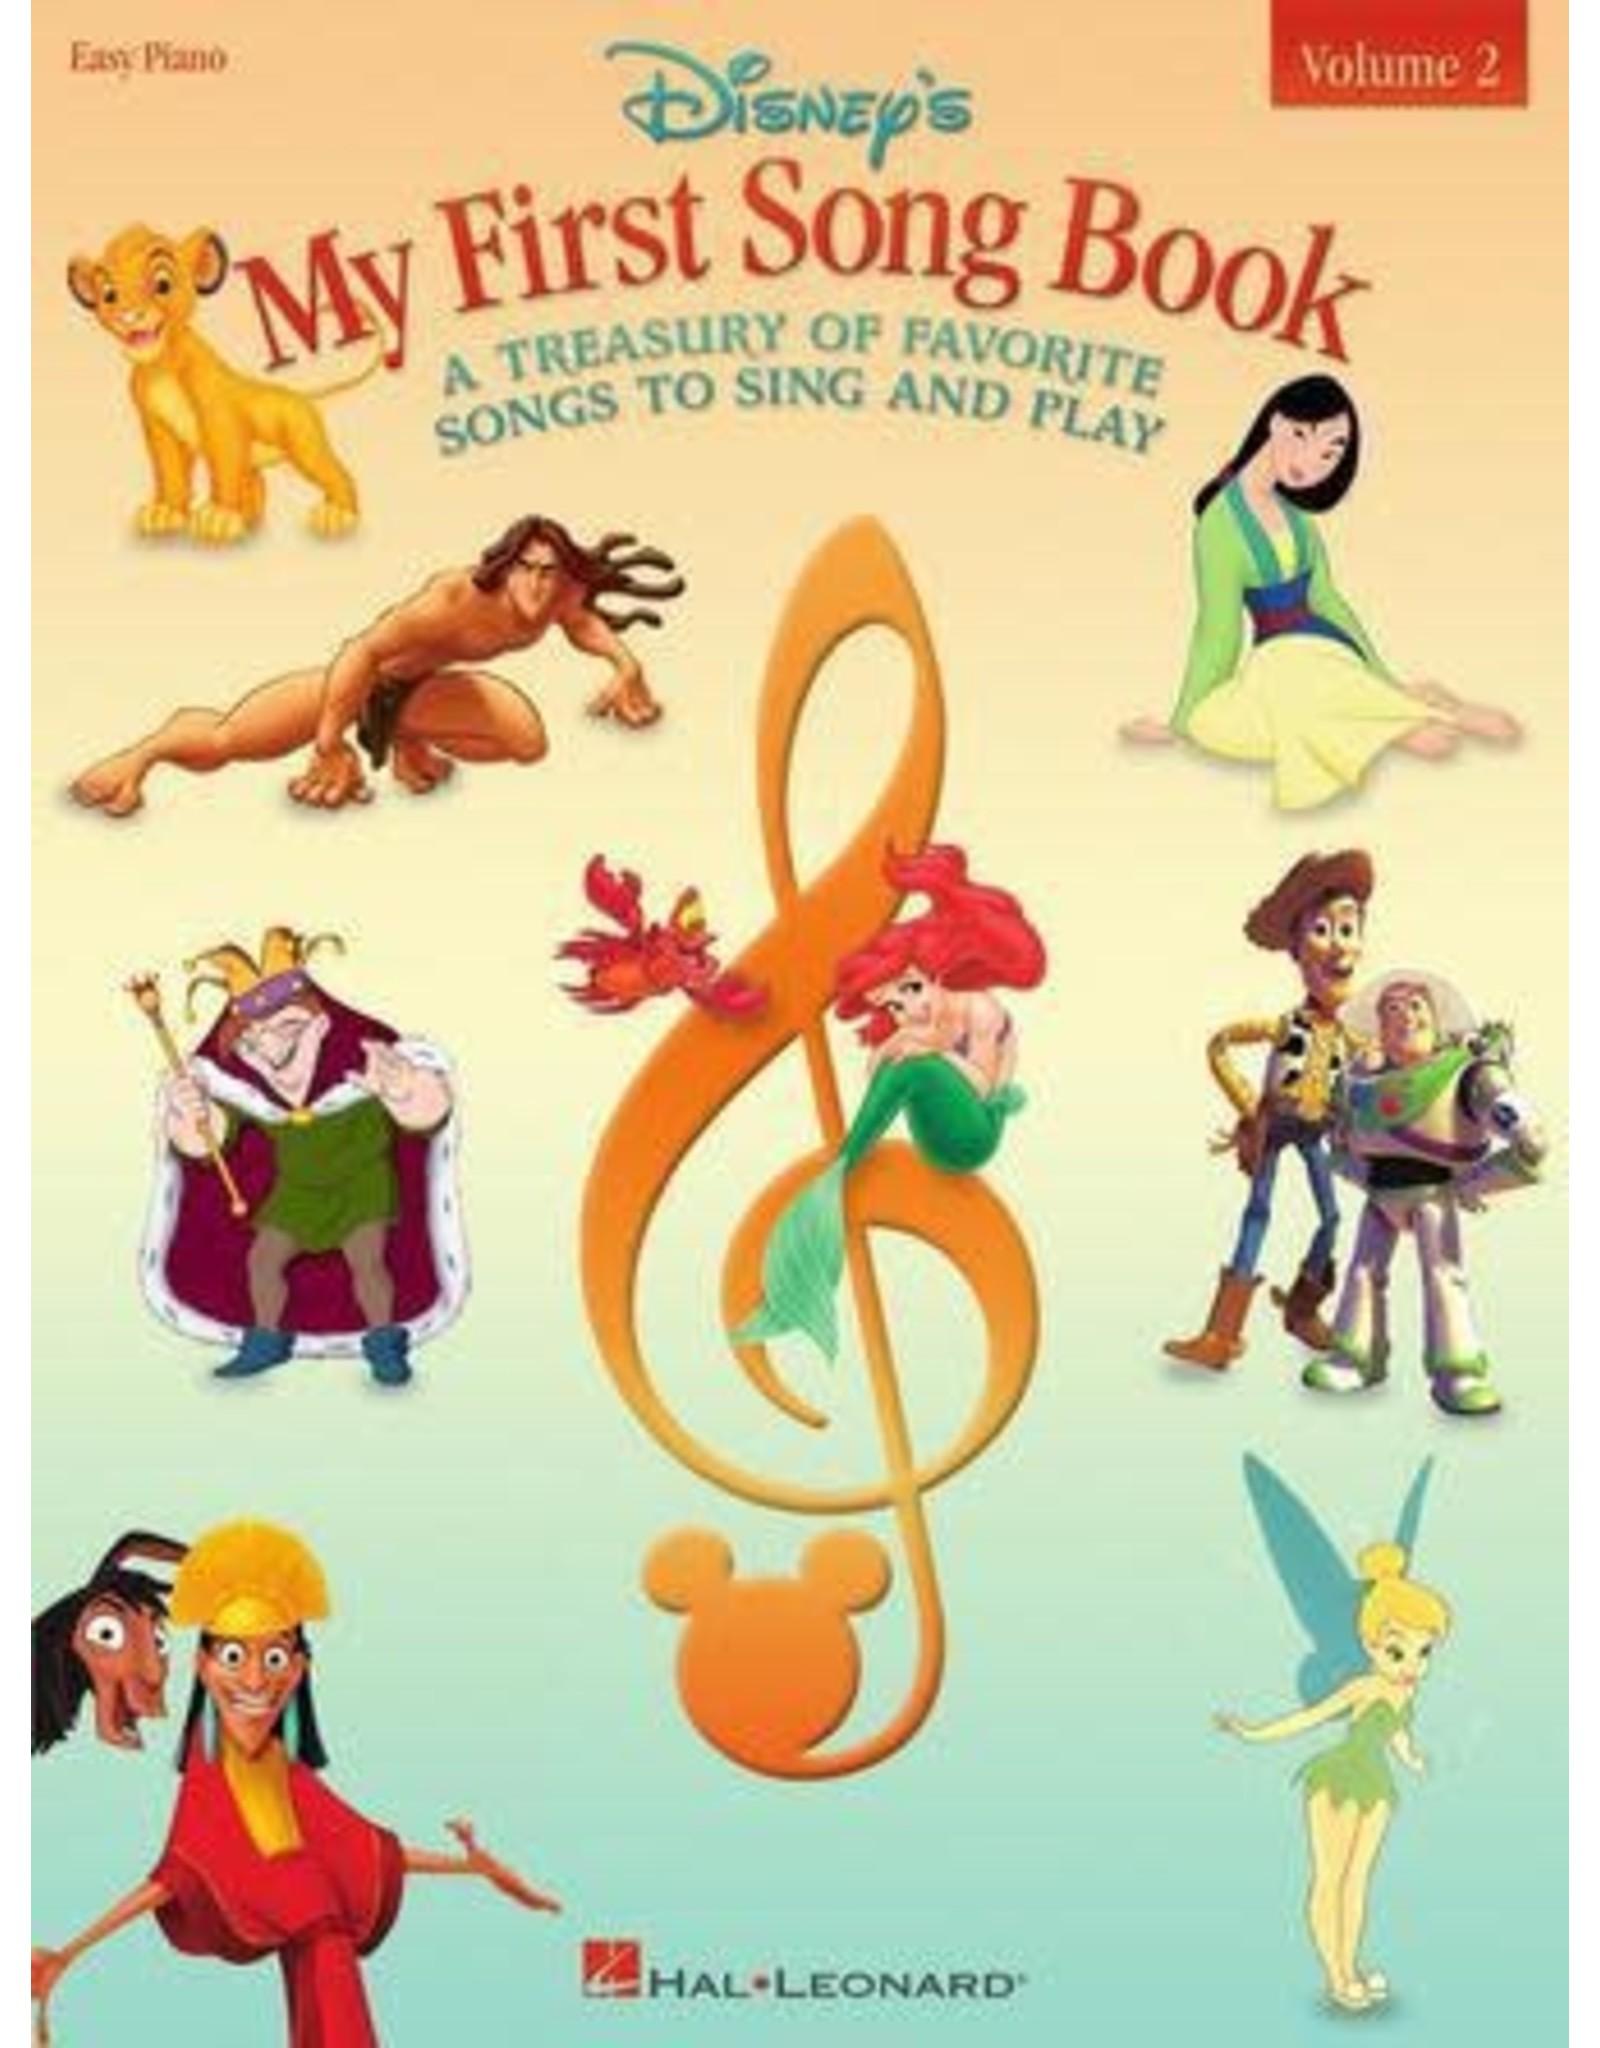 Hal Leonard Disney's My First Songbook Volume 2 - Easy Piano